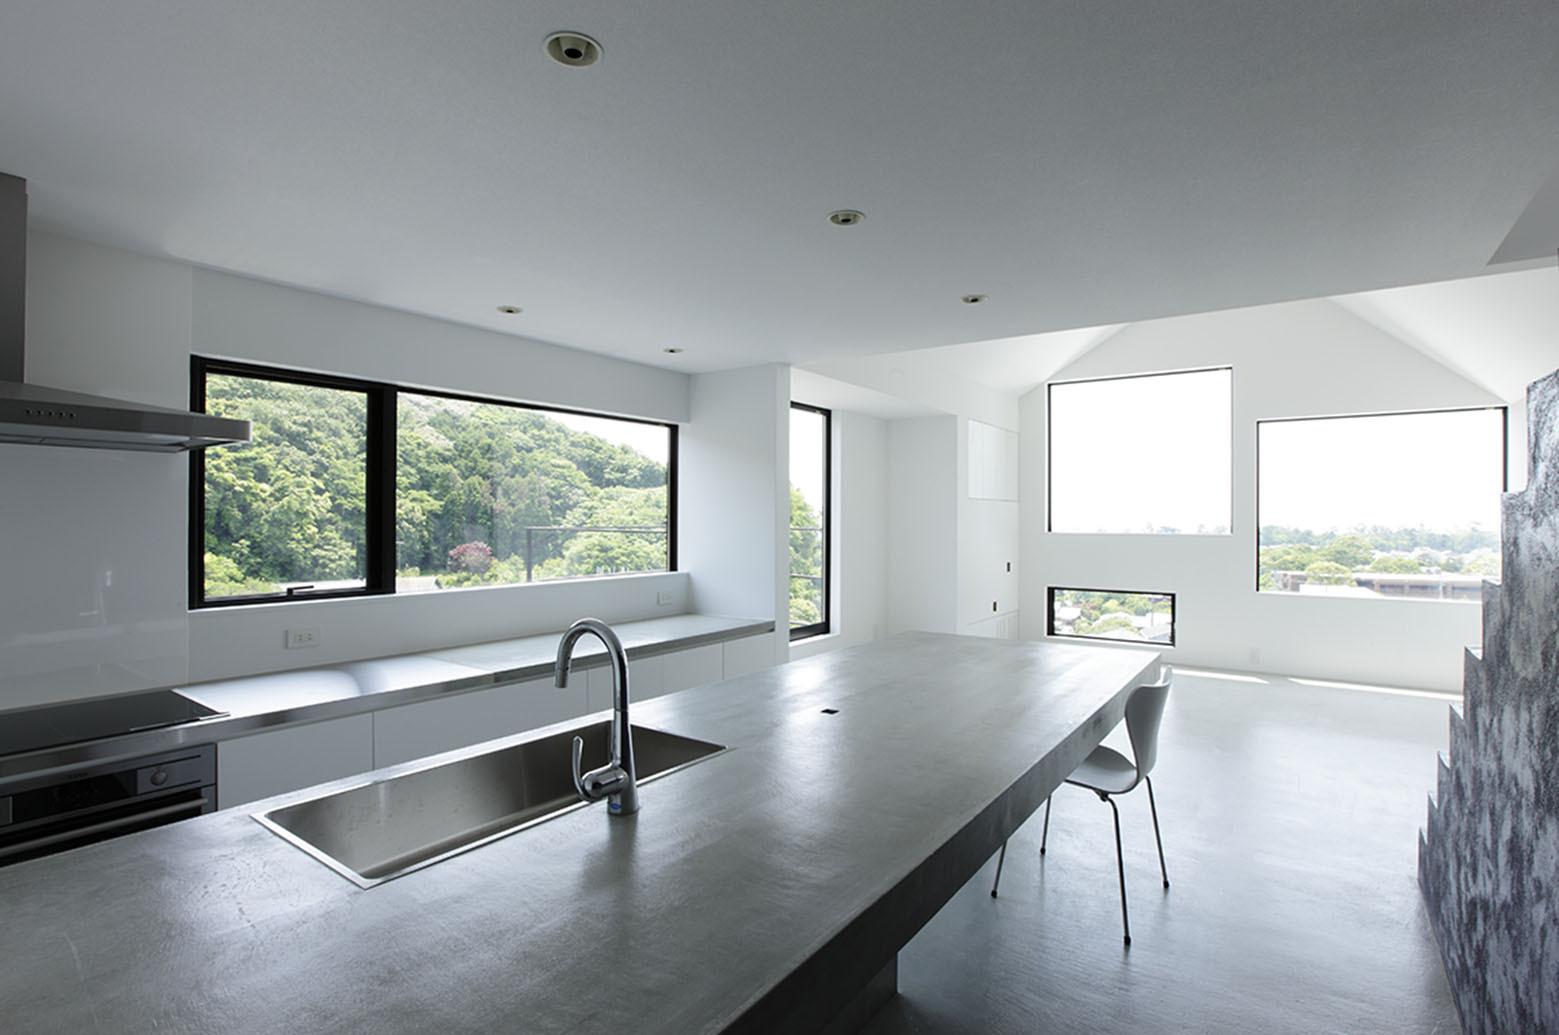 Sol hitoshi saruta plataforma arquitectura for Kitchen design 65 infanteria